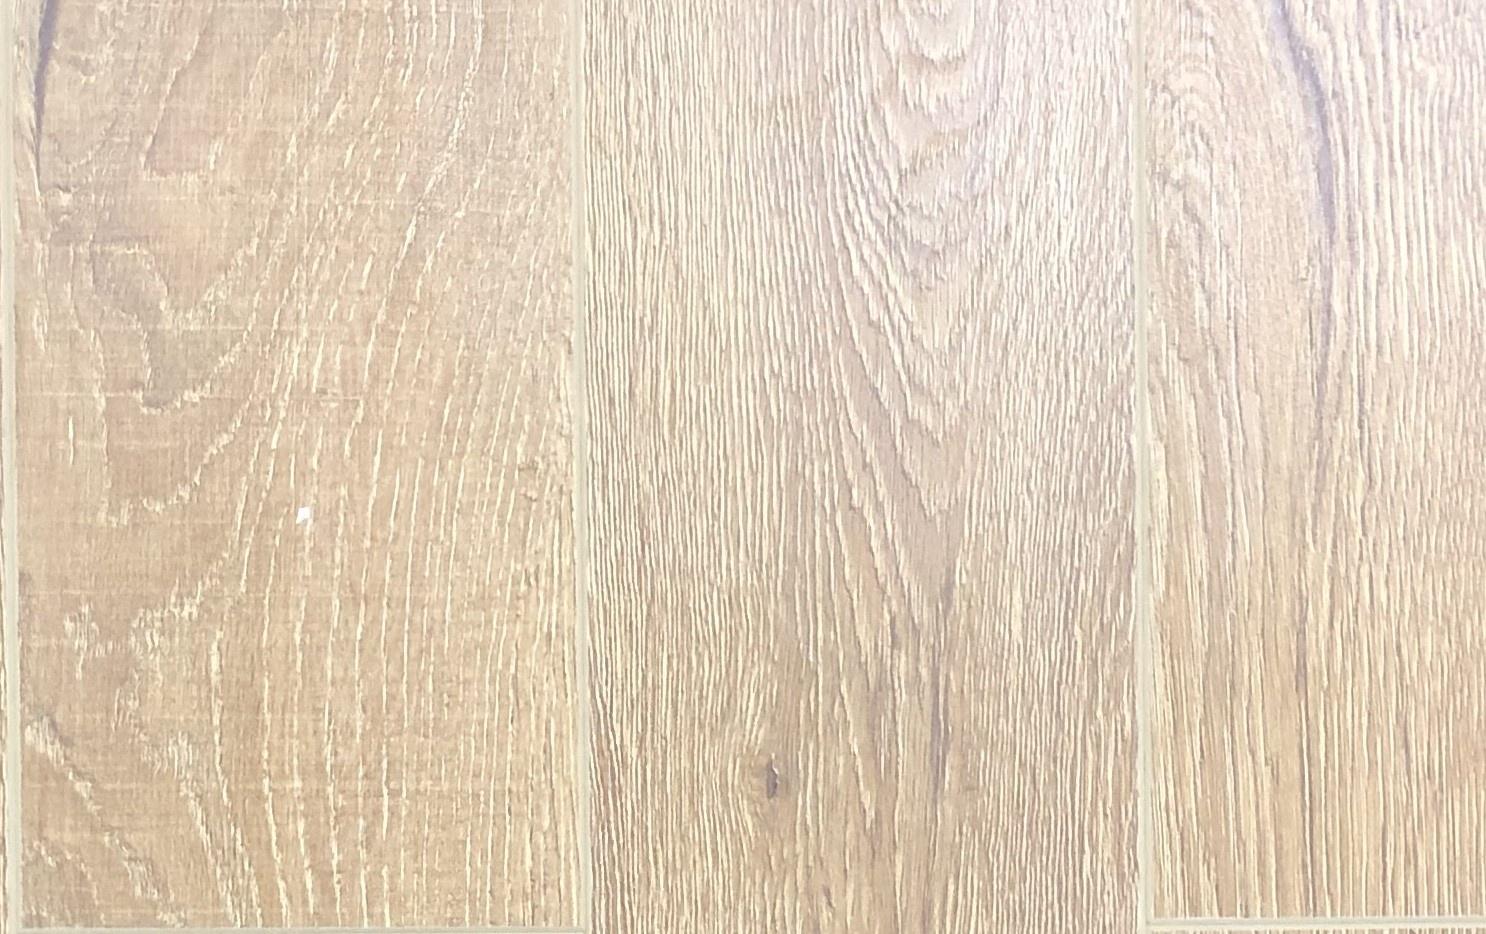 Ламинат Tarkett 504445004, светло-коричневый, бежевый